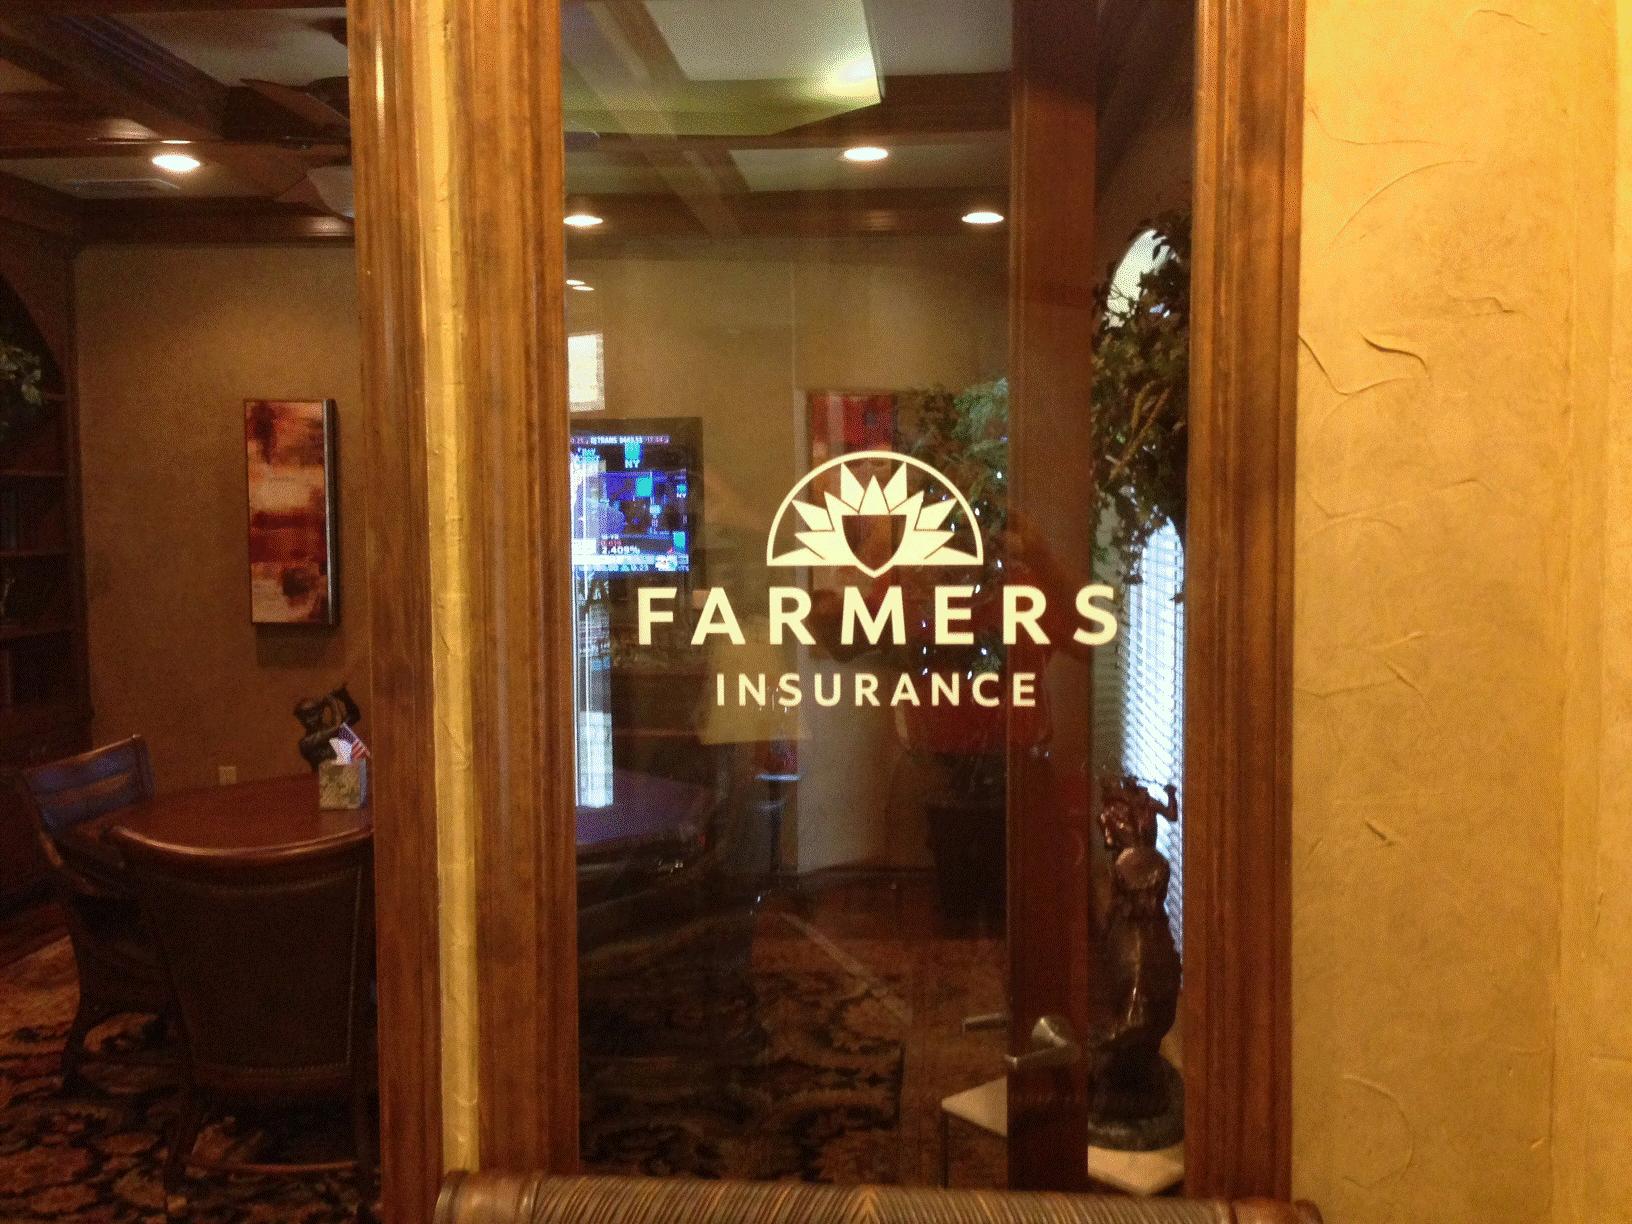 Farmers Insurance - Michael Crise image 1